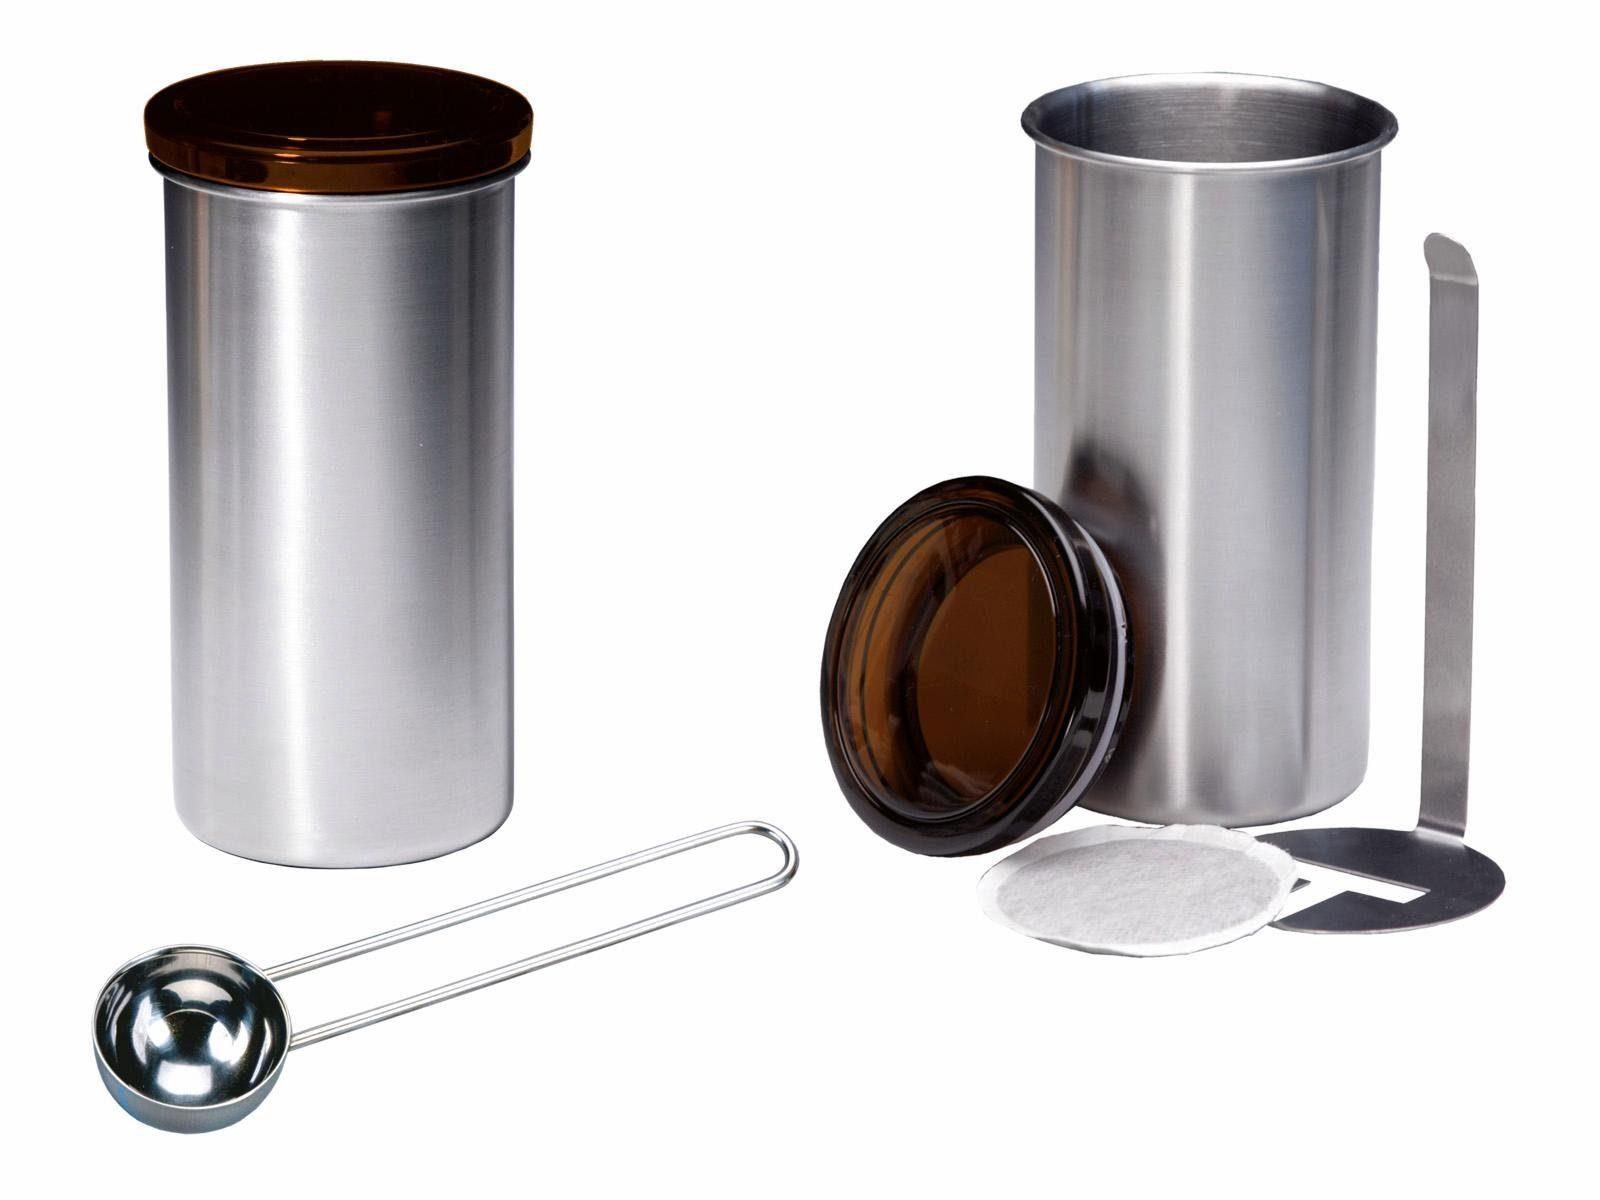 CHG Kaffeepad-Dose mit »Lifesystem«, 2 Stück, rostfreien Edelstahl/ Kunststoff ABS + Kaffeemaß